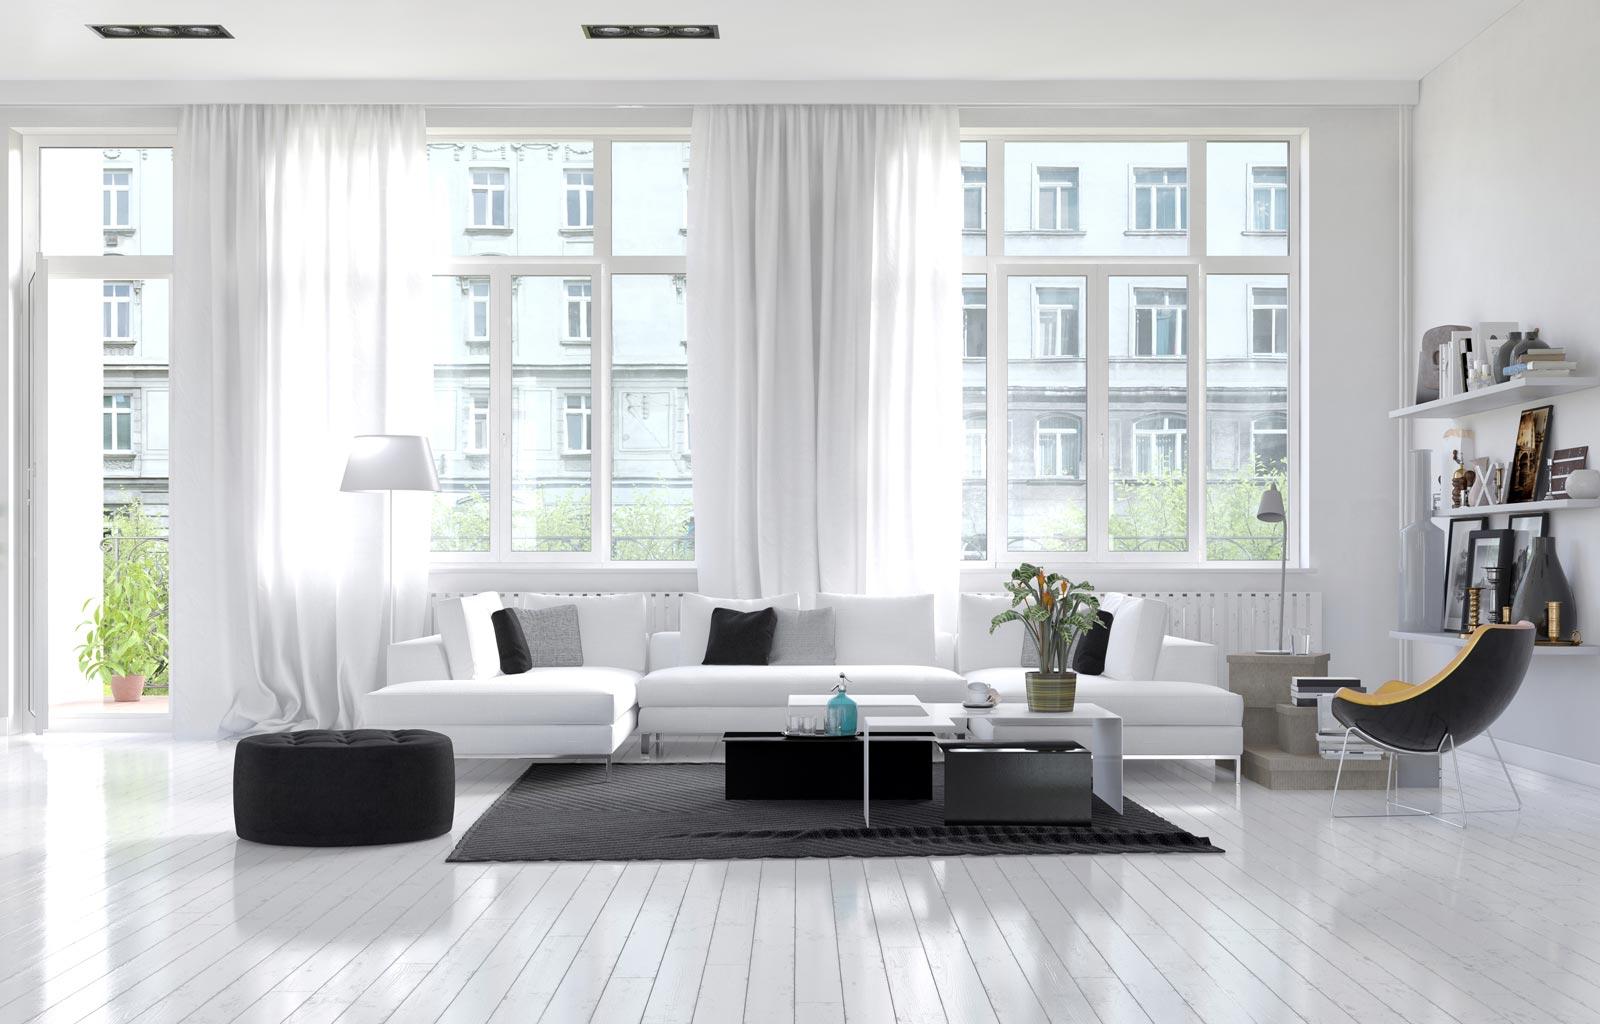 bigstock-Large-spacious-modern-white-li-93095723